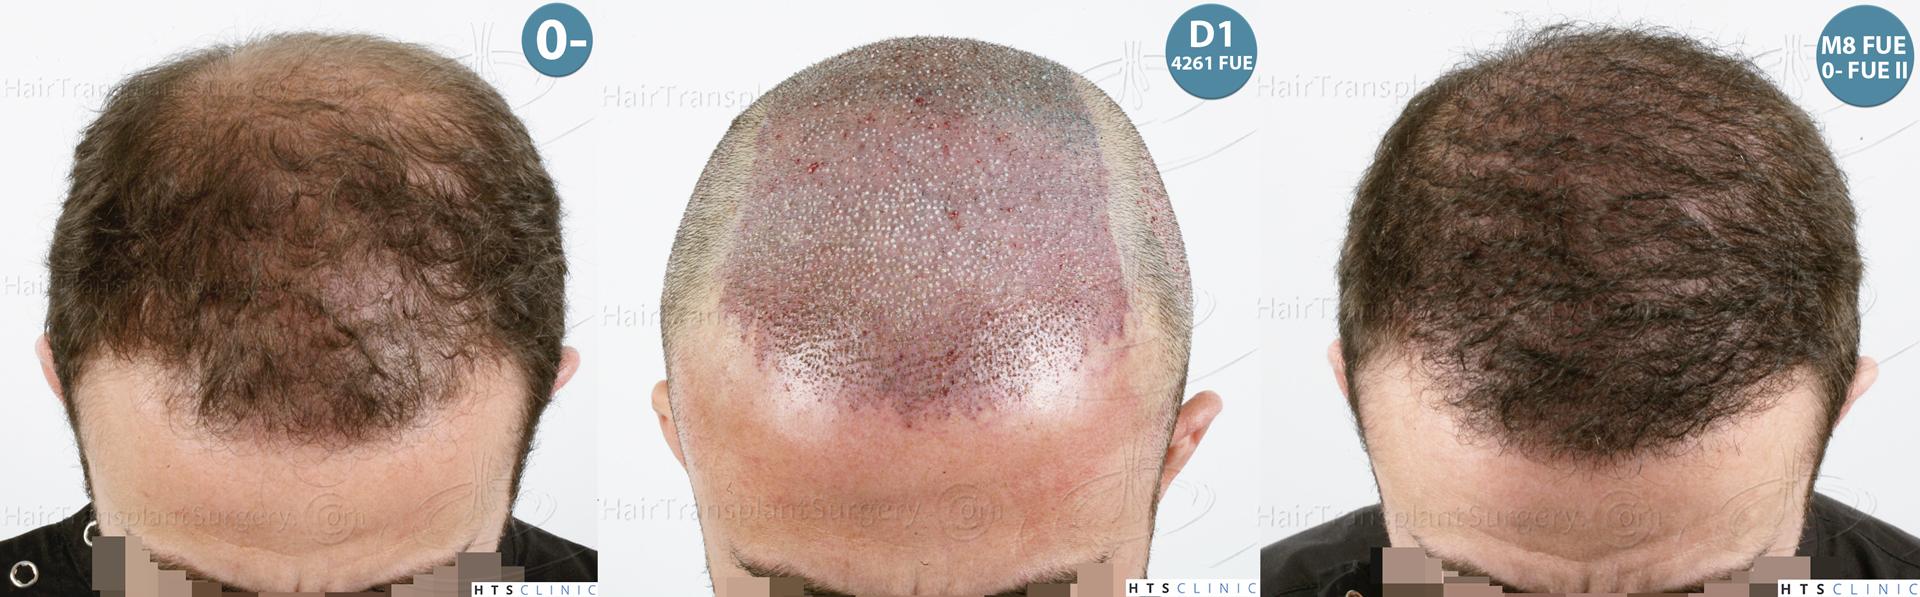 Dr.Devroye-HTS-Clinic-6326-FUE-_4261_2065_-Montage-2.jpg